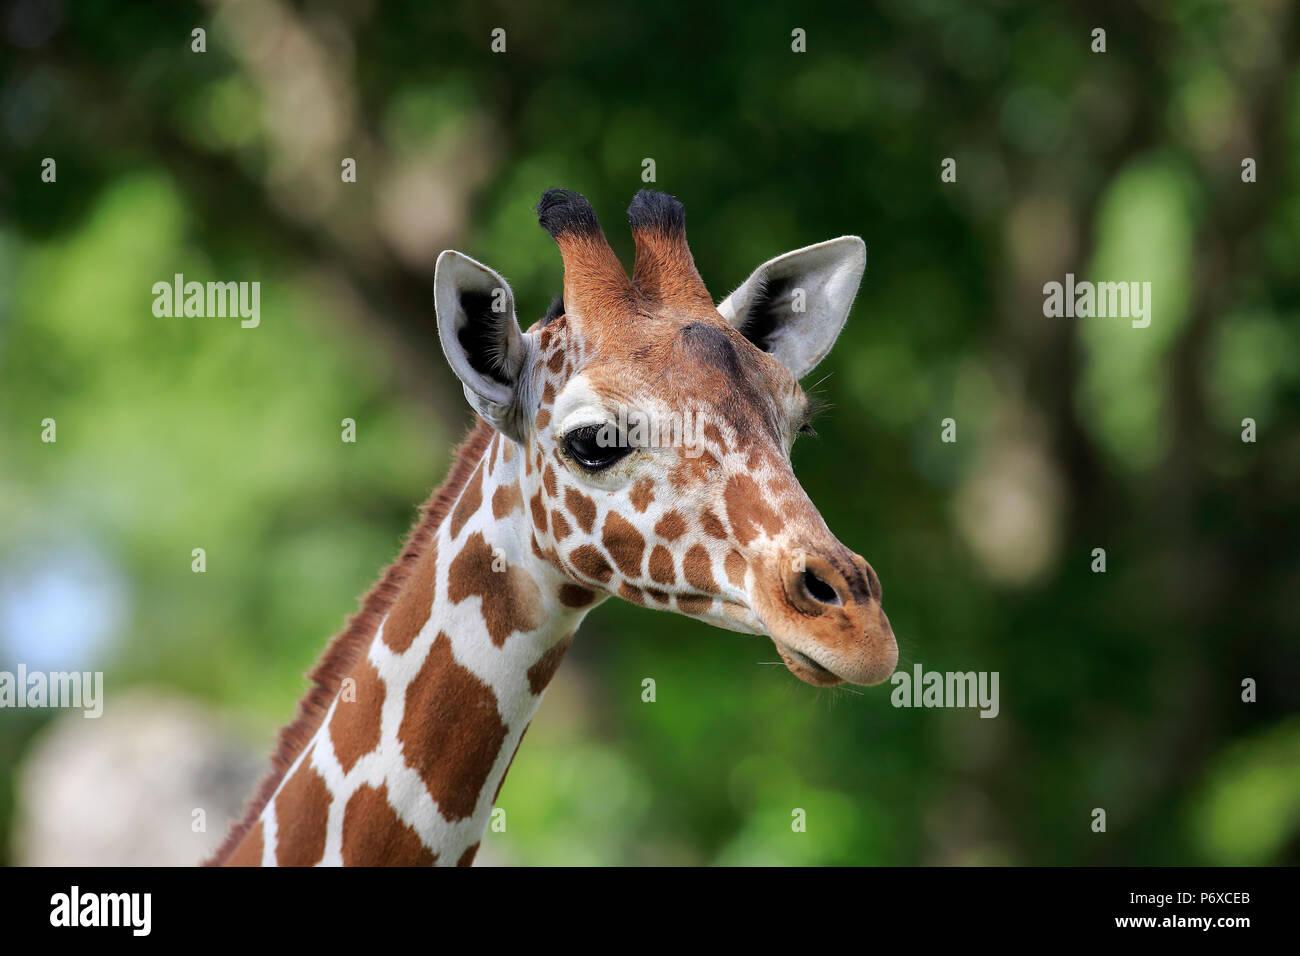 Reticulated Giraffe, adult portrait, Africa, Giraffa camelopardalis reticulata - Stock Image